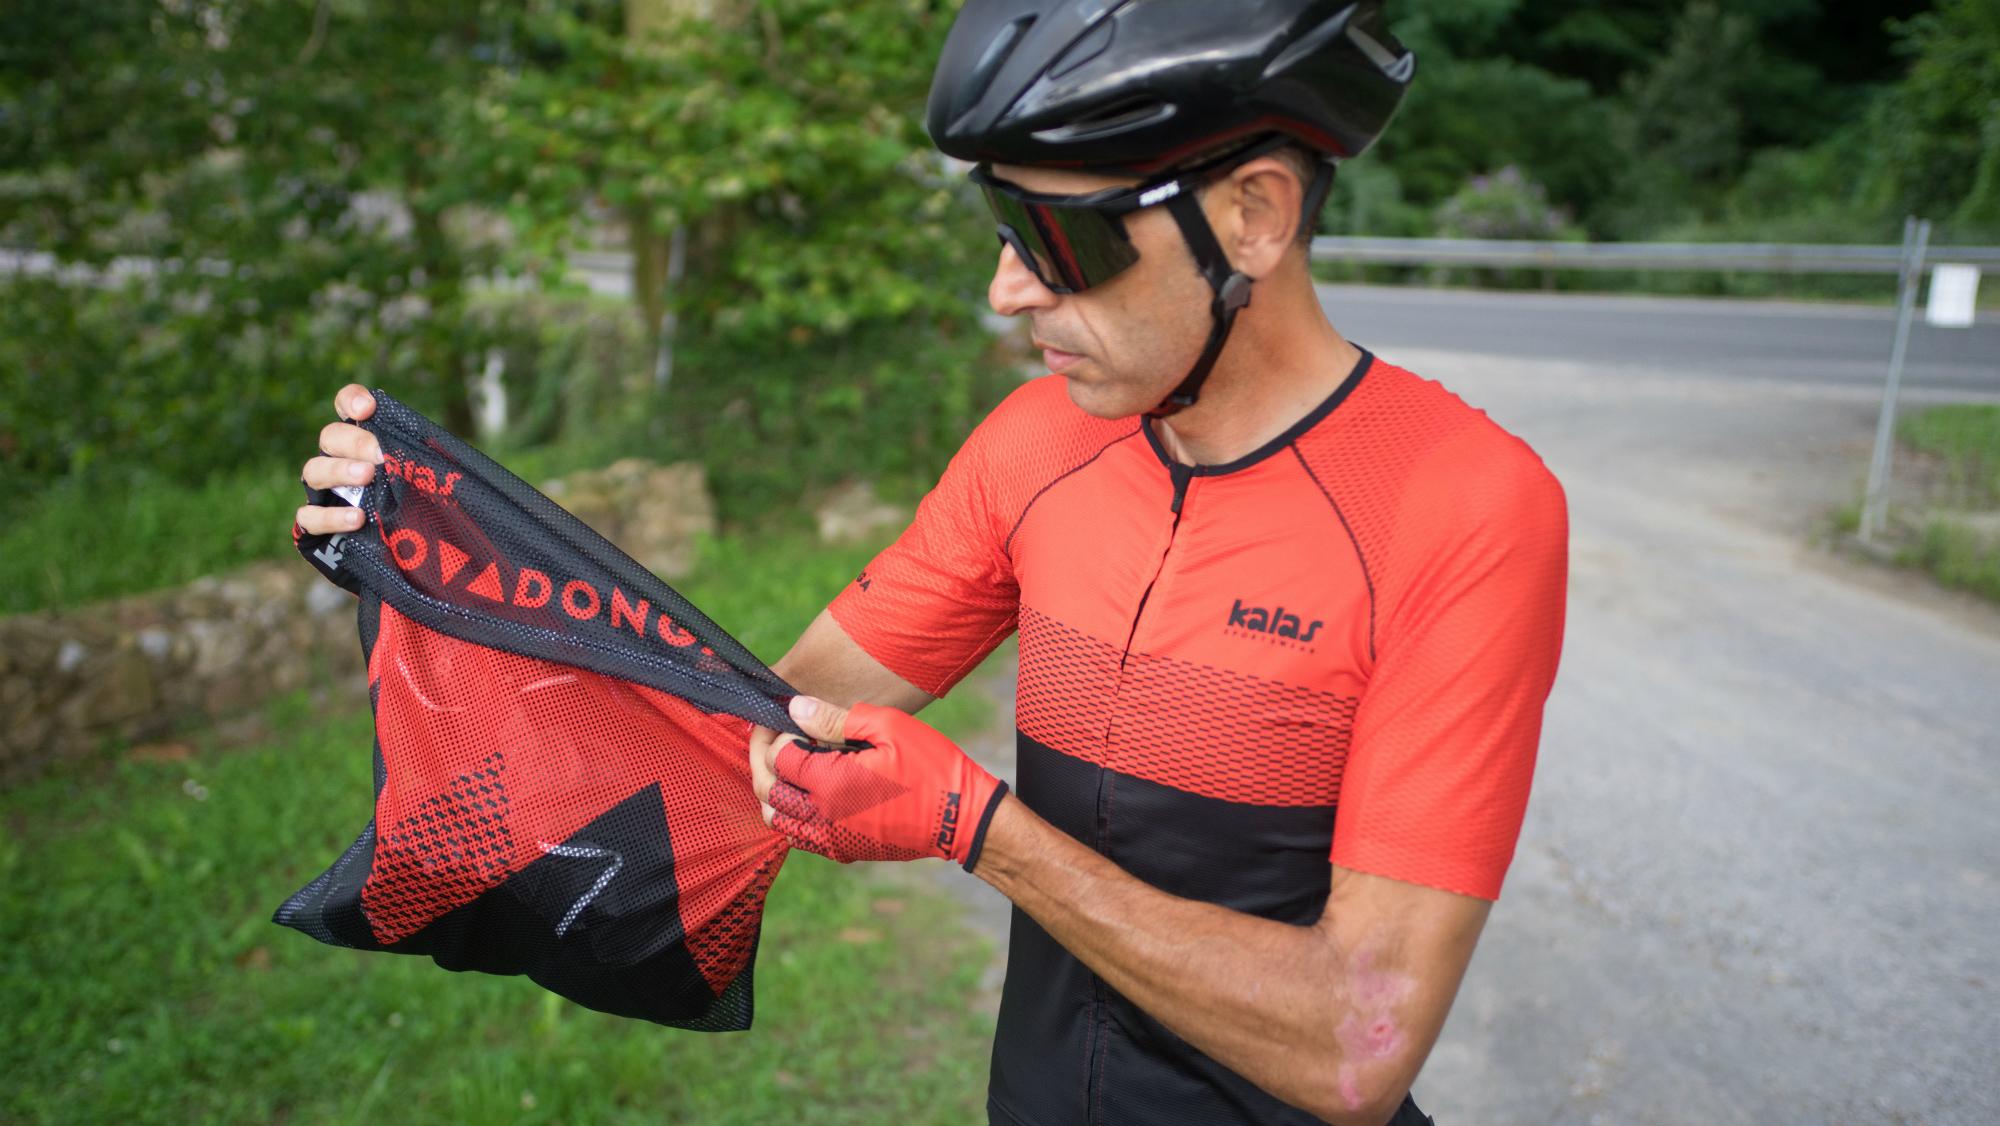 a cyclist holding the kalas covadonga jersey